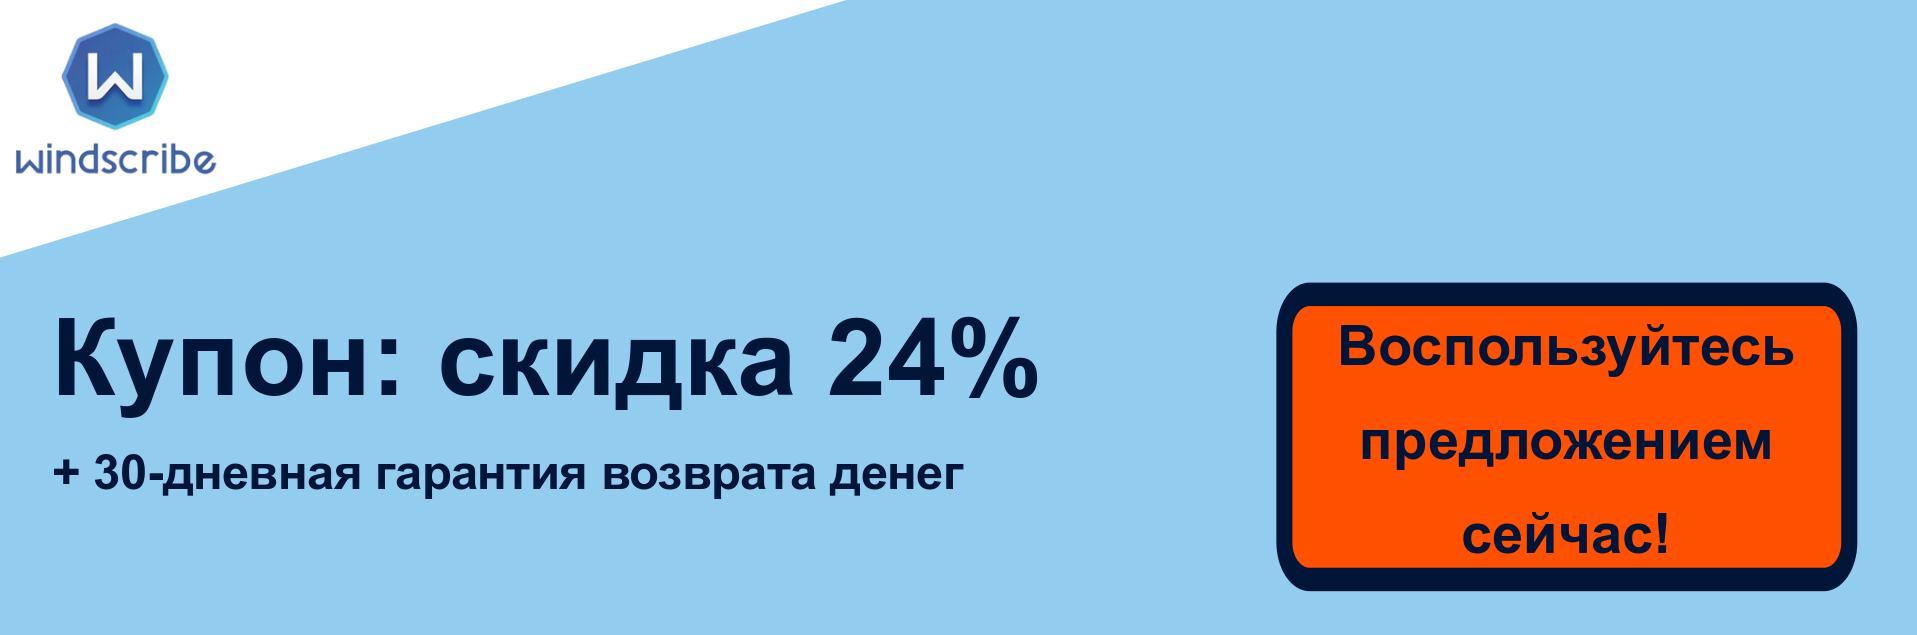 Баннерный купон WindScribe VPN - скидка 24%